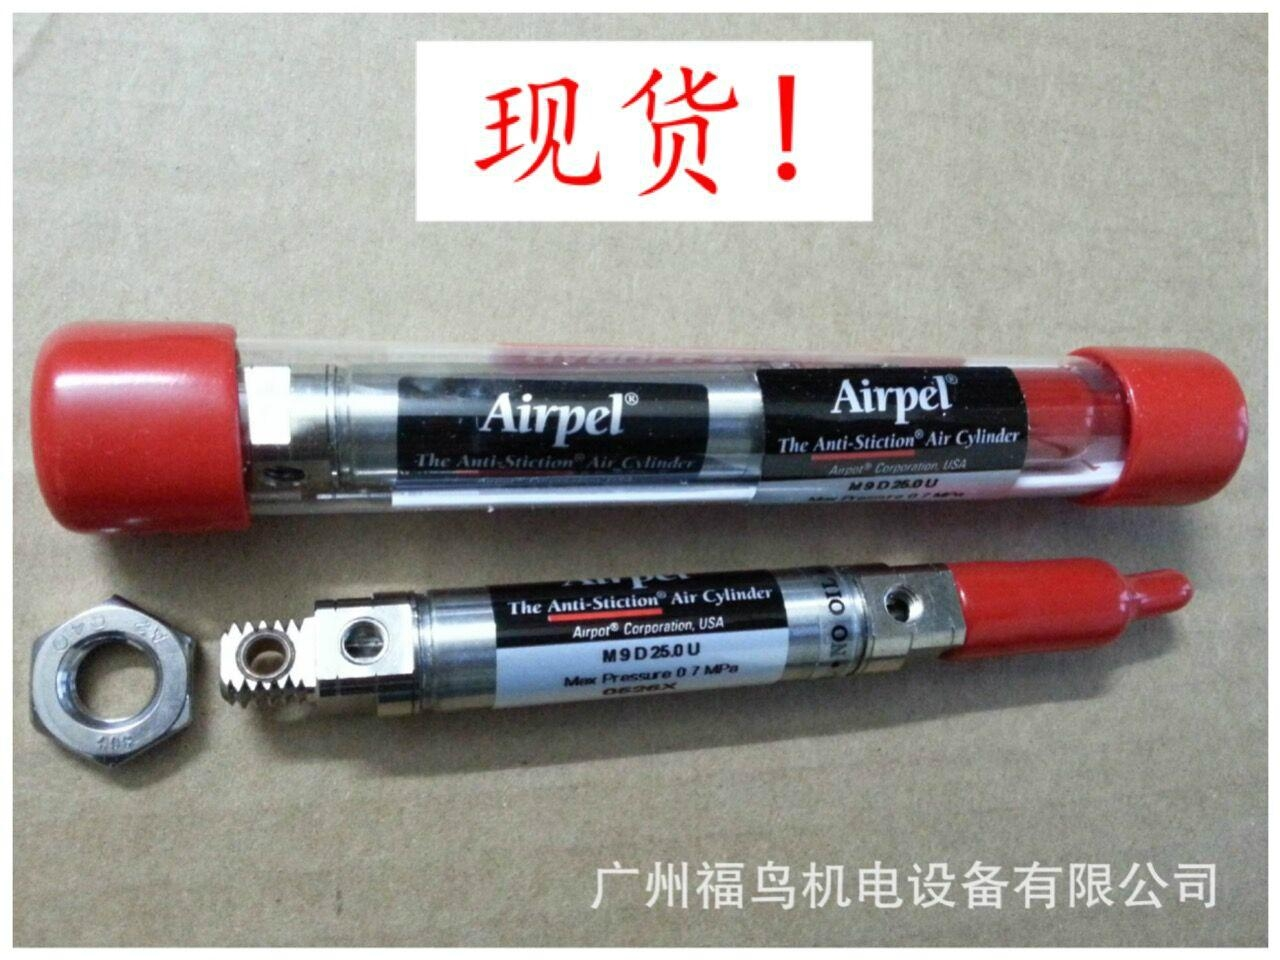 AIRPEL玻璃氣缸, 型號: M9D25.0U